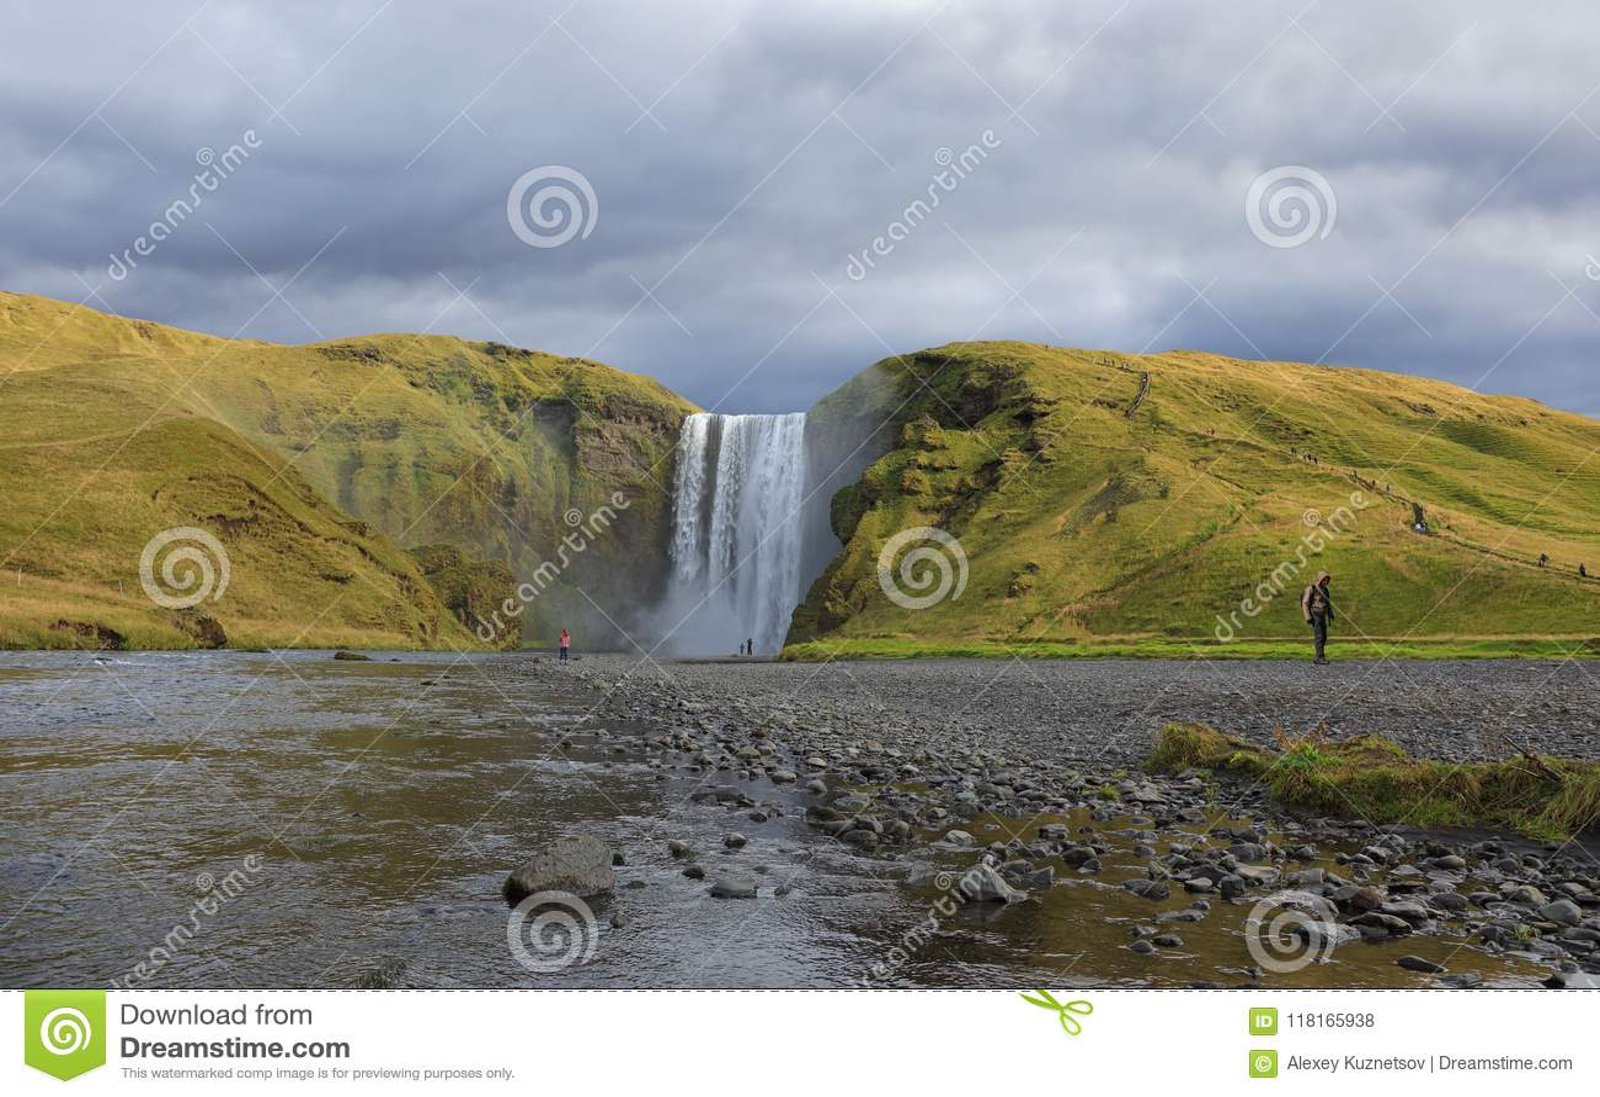 Amazing Skogafoss waterfall in Iceland